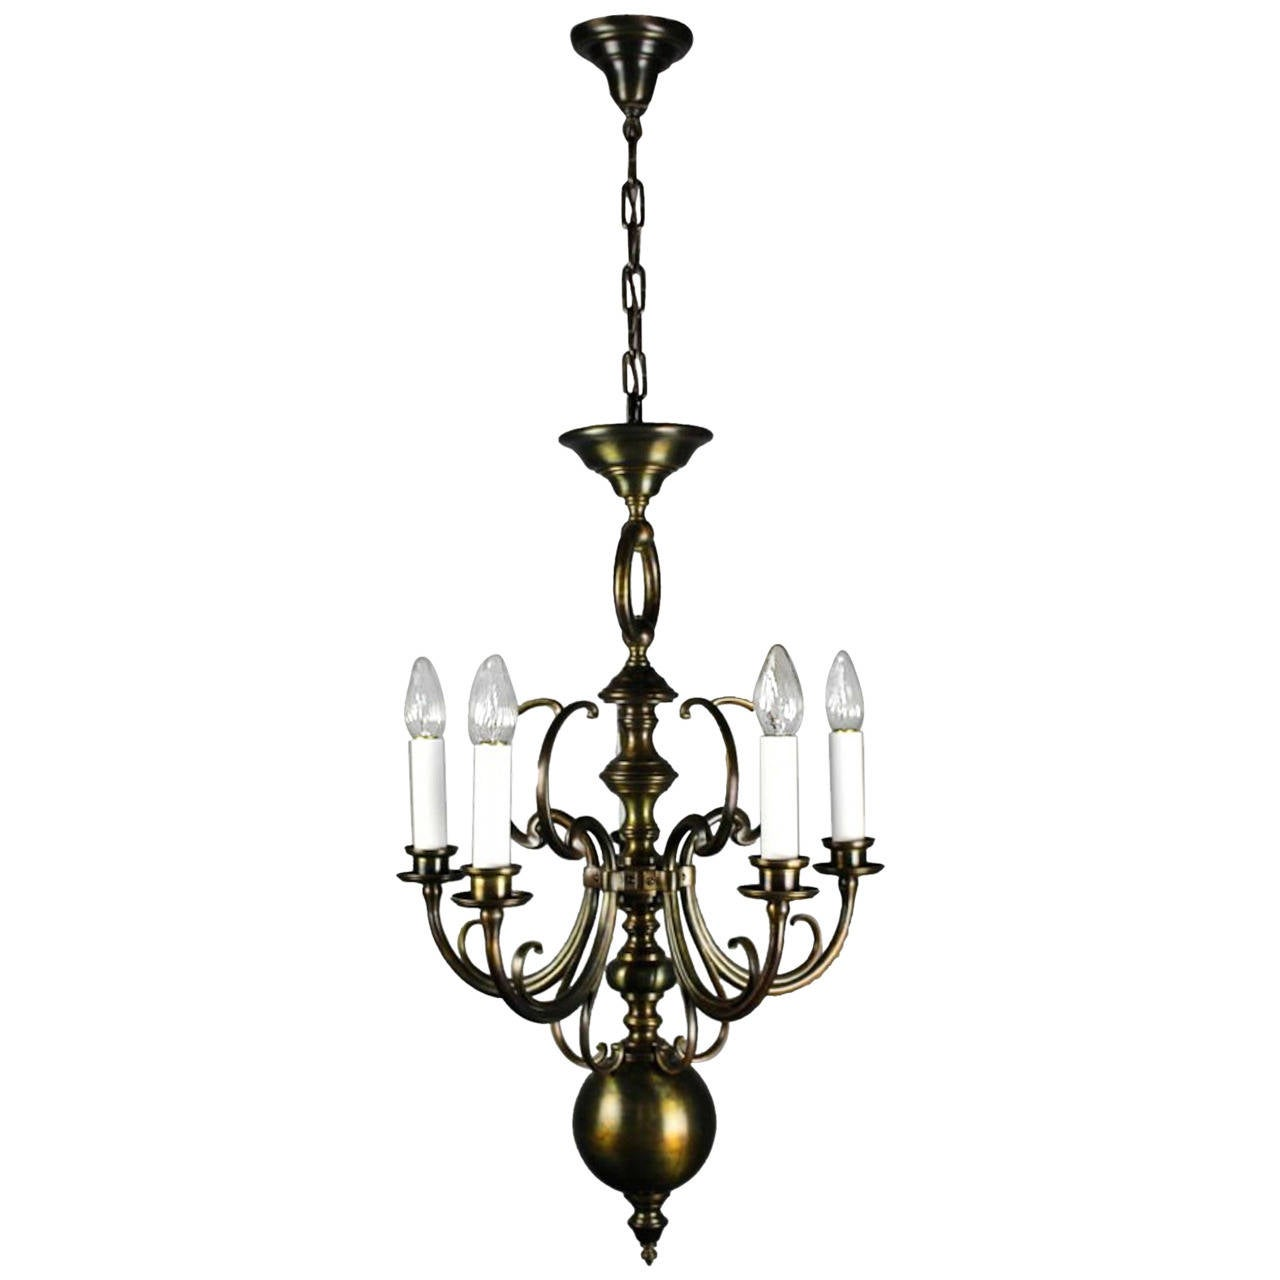 Unusual Art Nouveau Fixture 5 Light At 1stdibs